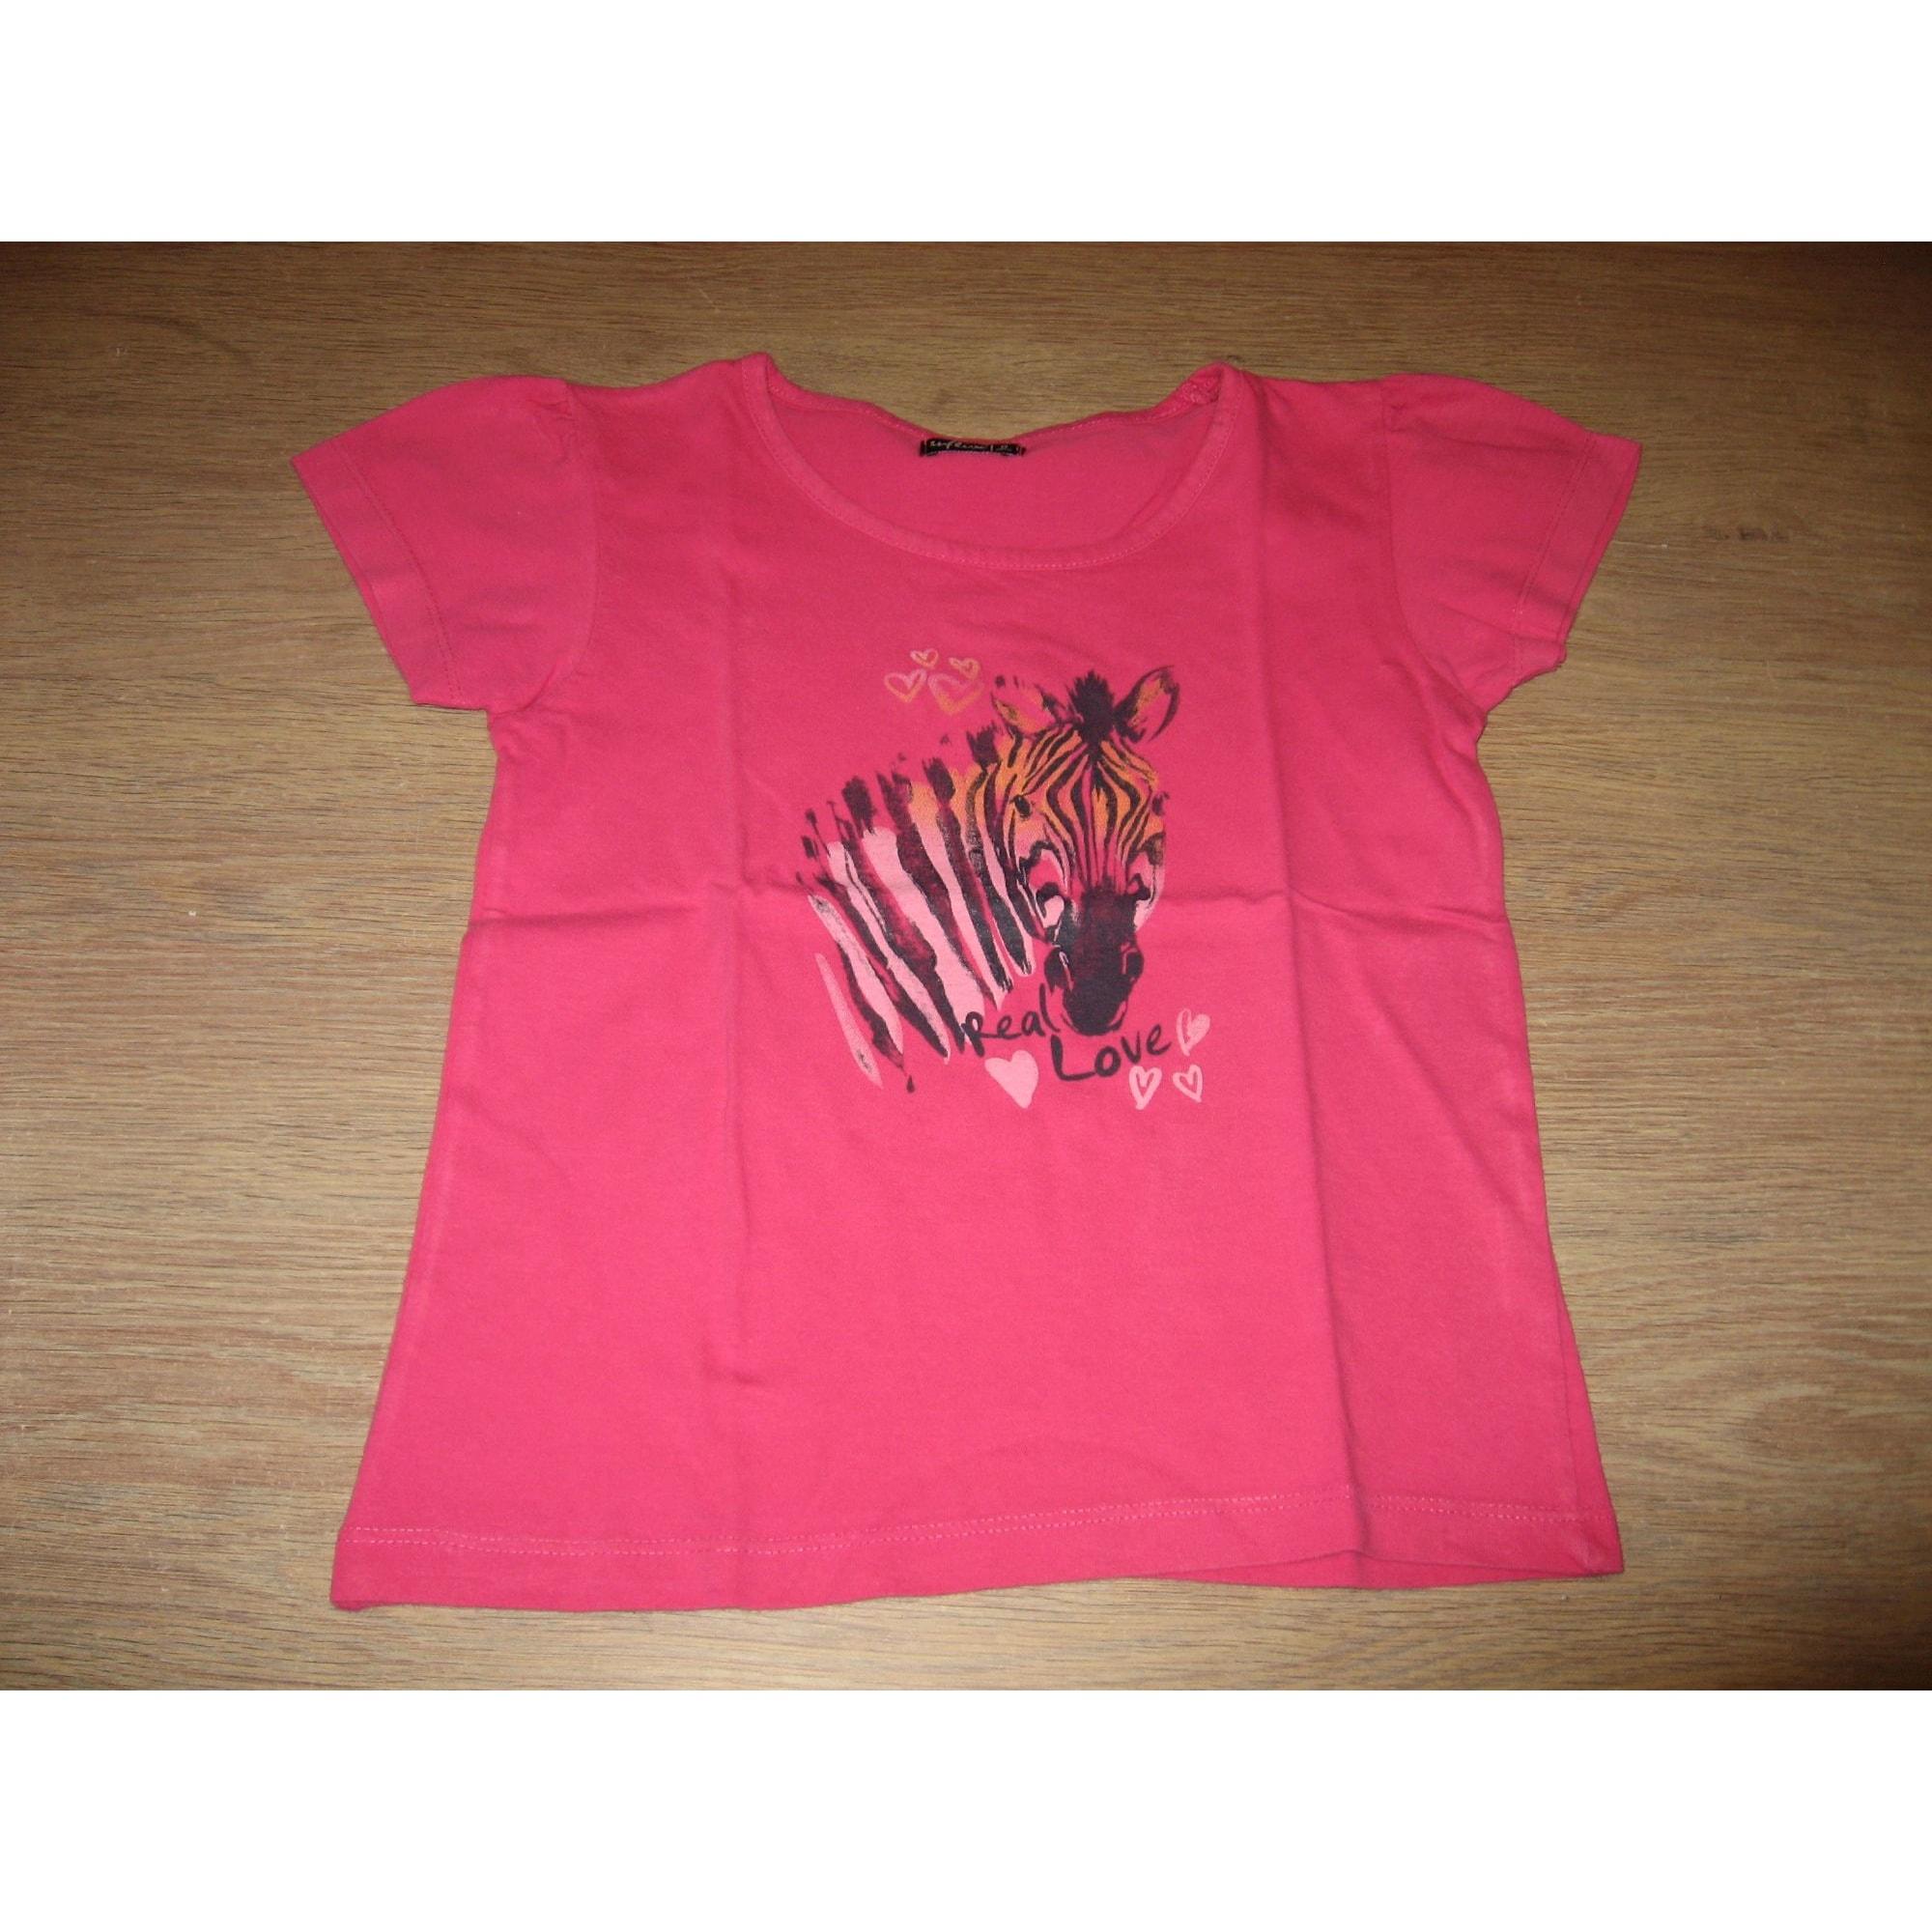 Top, Tee-shirt INFLUX Rose, fuschia, vieux rose